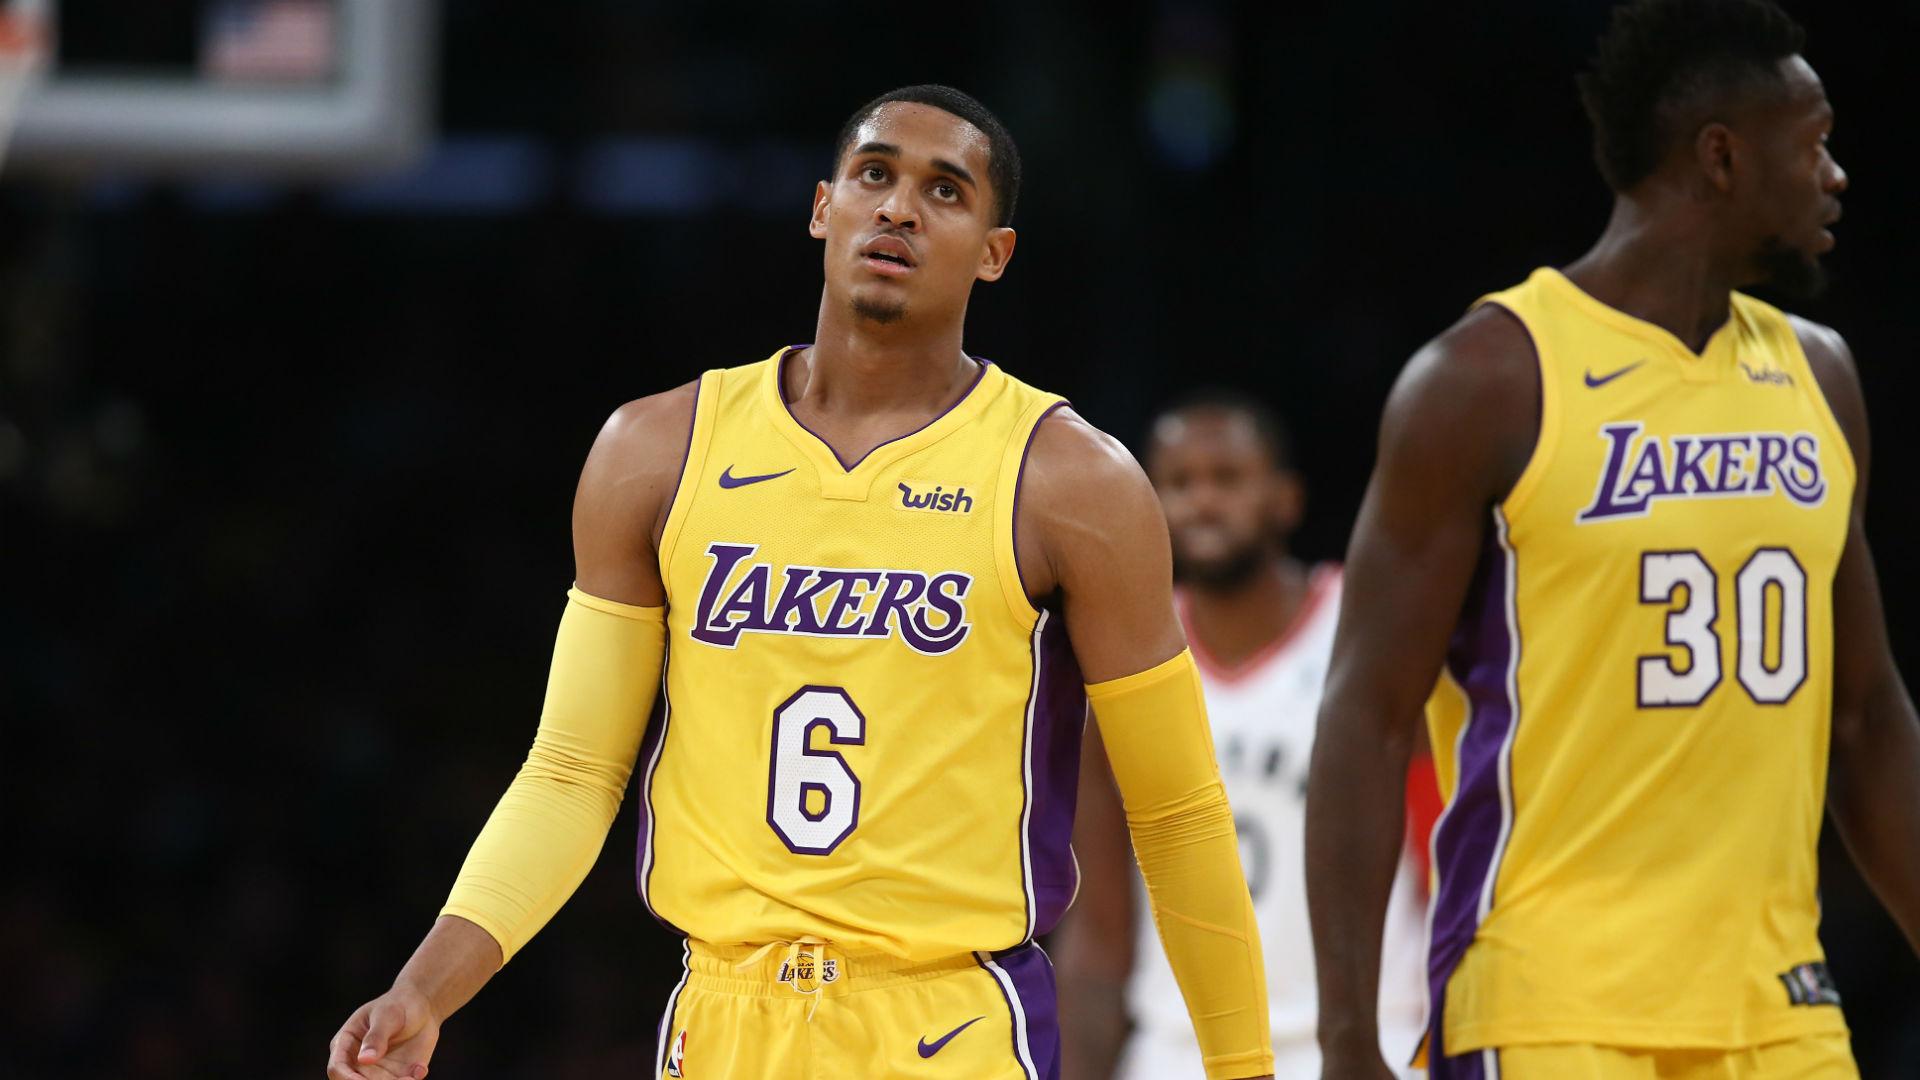 NBA trade rumors: Lakers have offered Julius Randle, Jordan Clarkson in trade talks